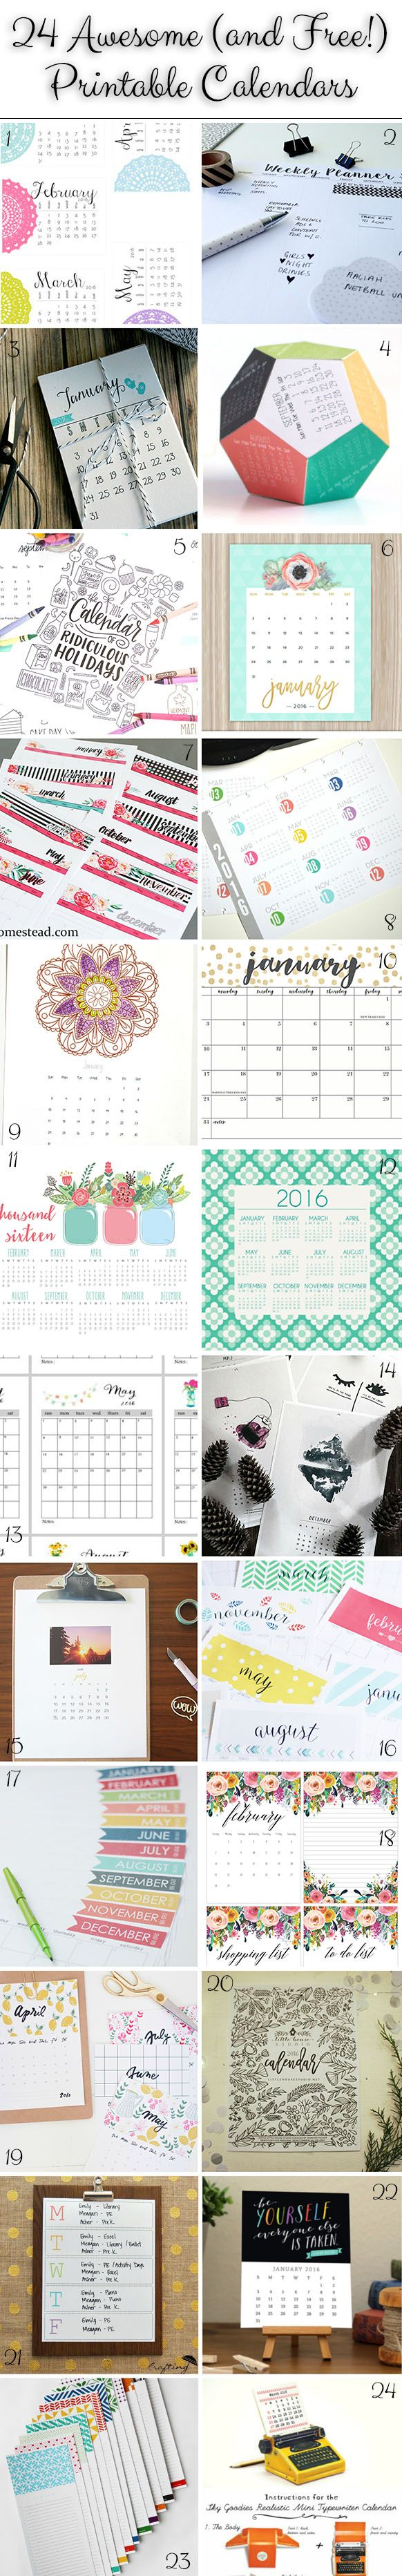 Scrapbook ideas calendar pages - Weekend Pinspiration Pretty Printable Calendars